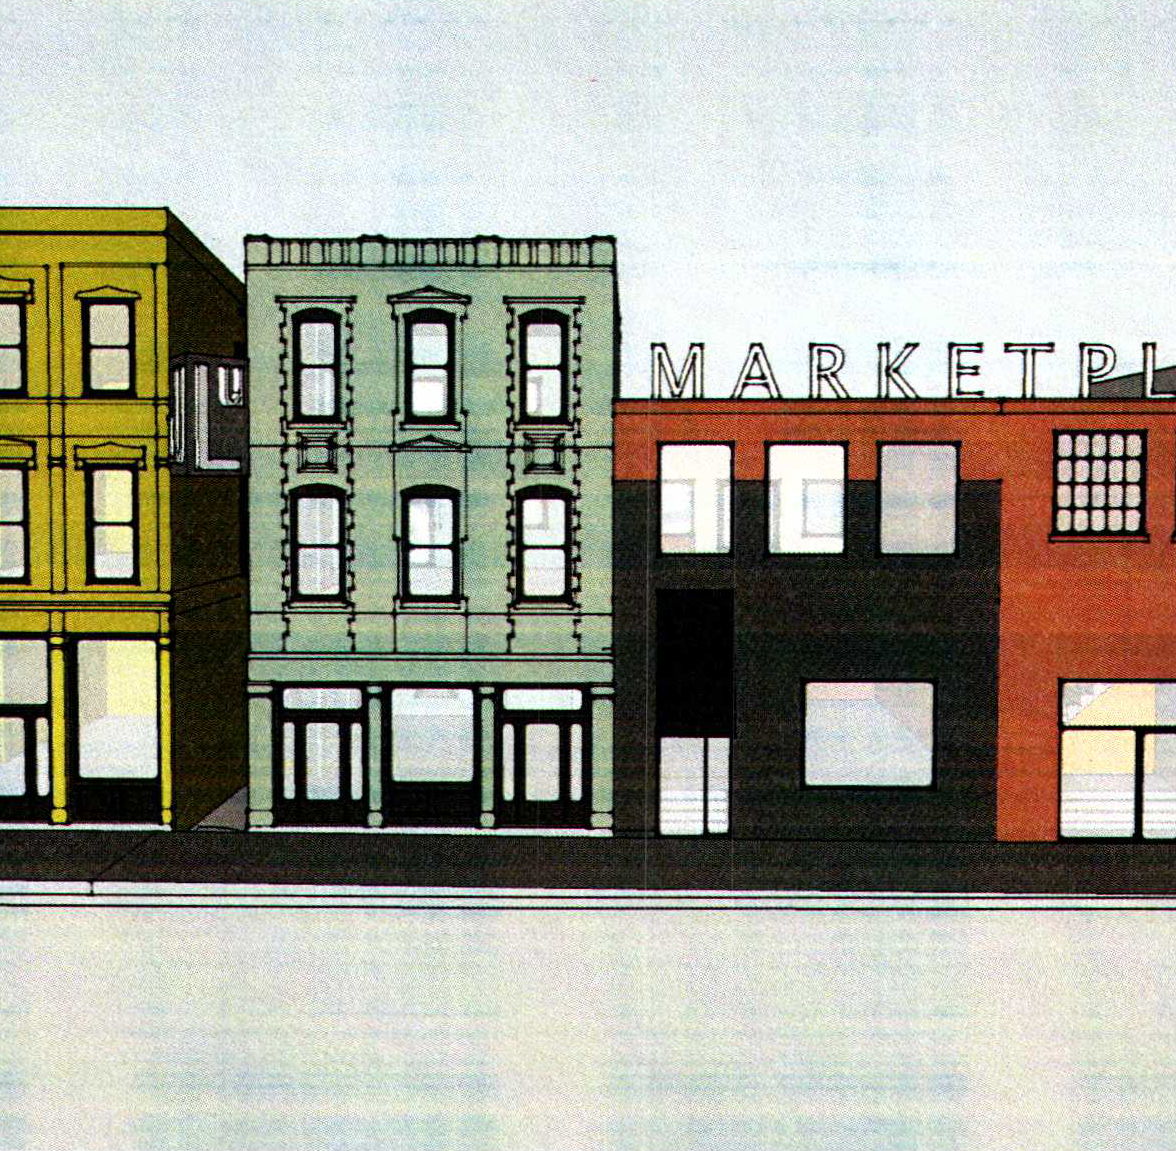 NuLu development will give revitalized neighborhood a retail facelift